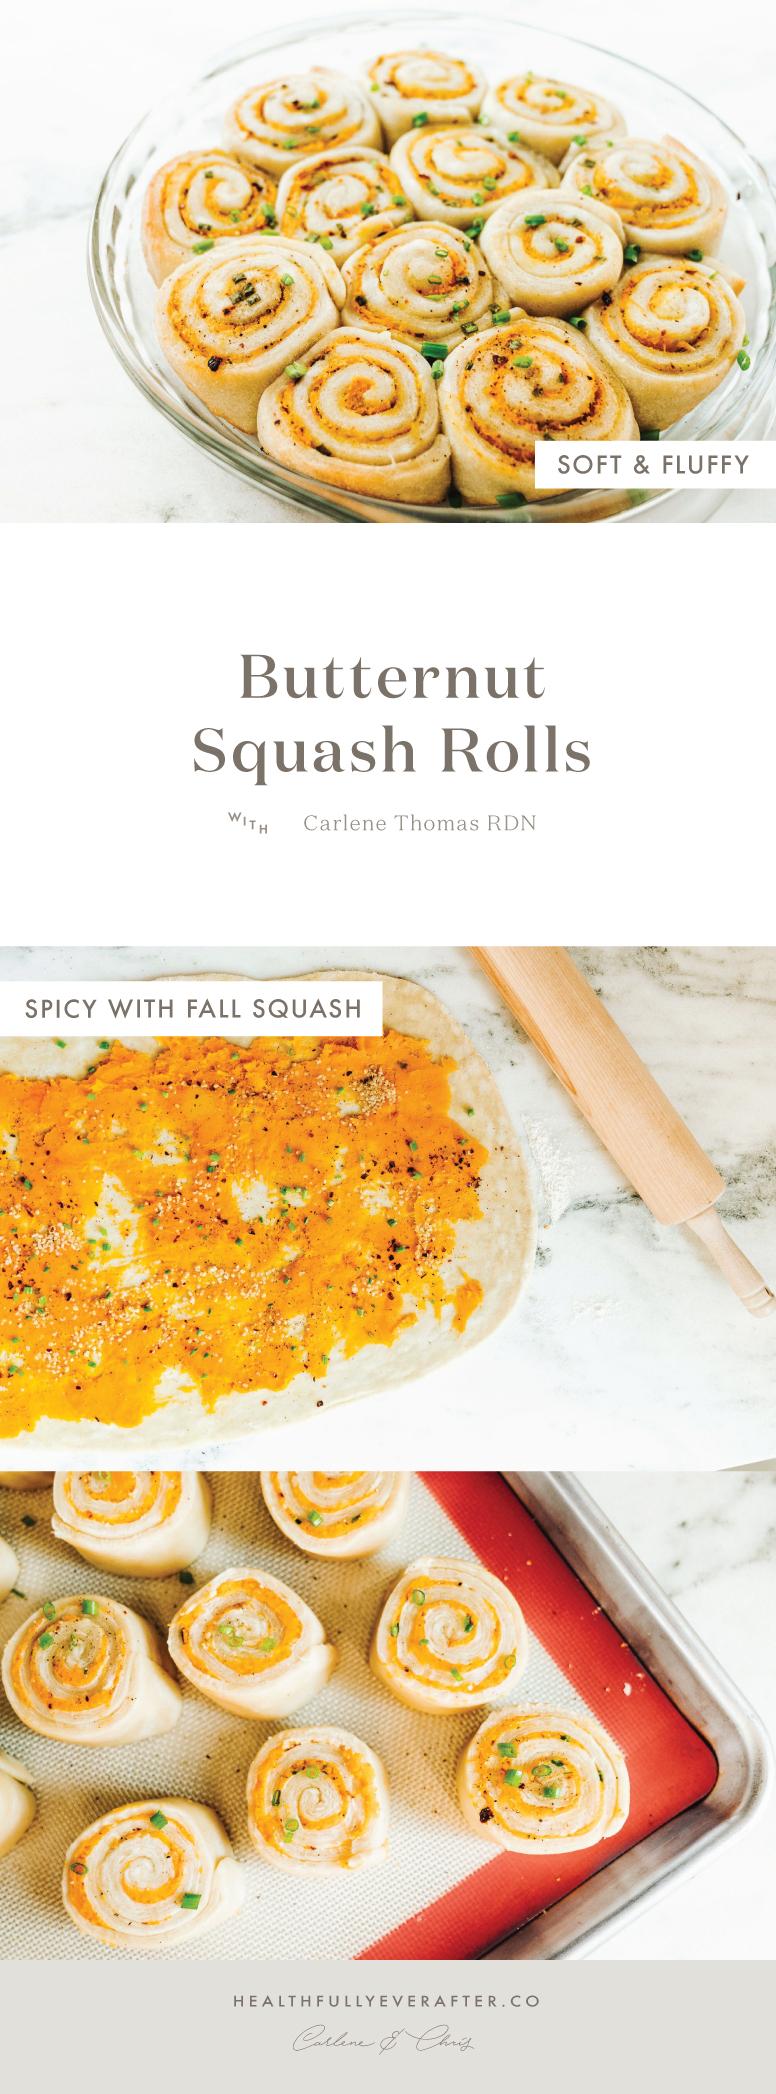 butternut squash soft swirl yeast rolls